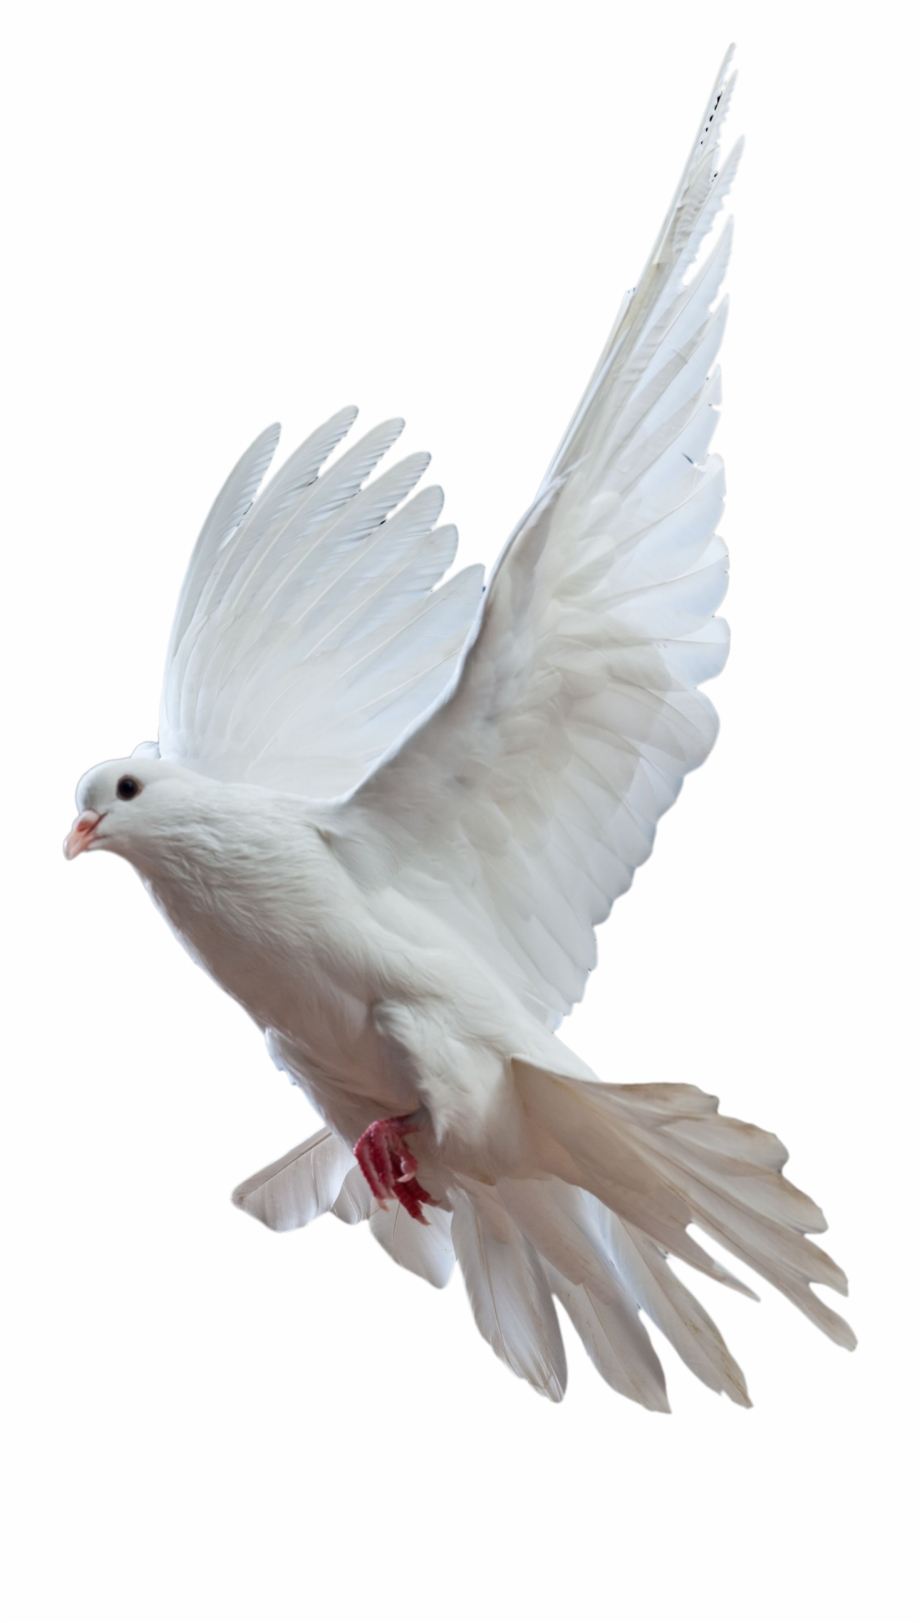 Kabutar clipart clip art freeuse Pigeon Png - Kabutar Png Free PNG Images & Clipart Download ... clip art freeuse